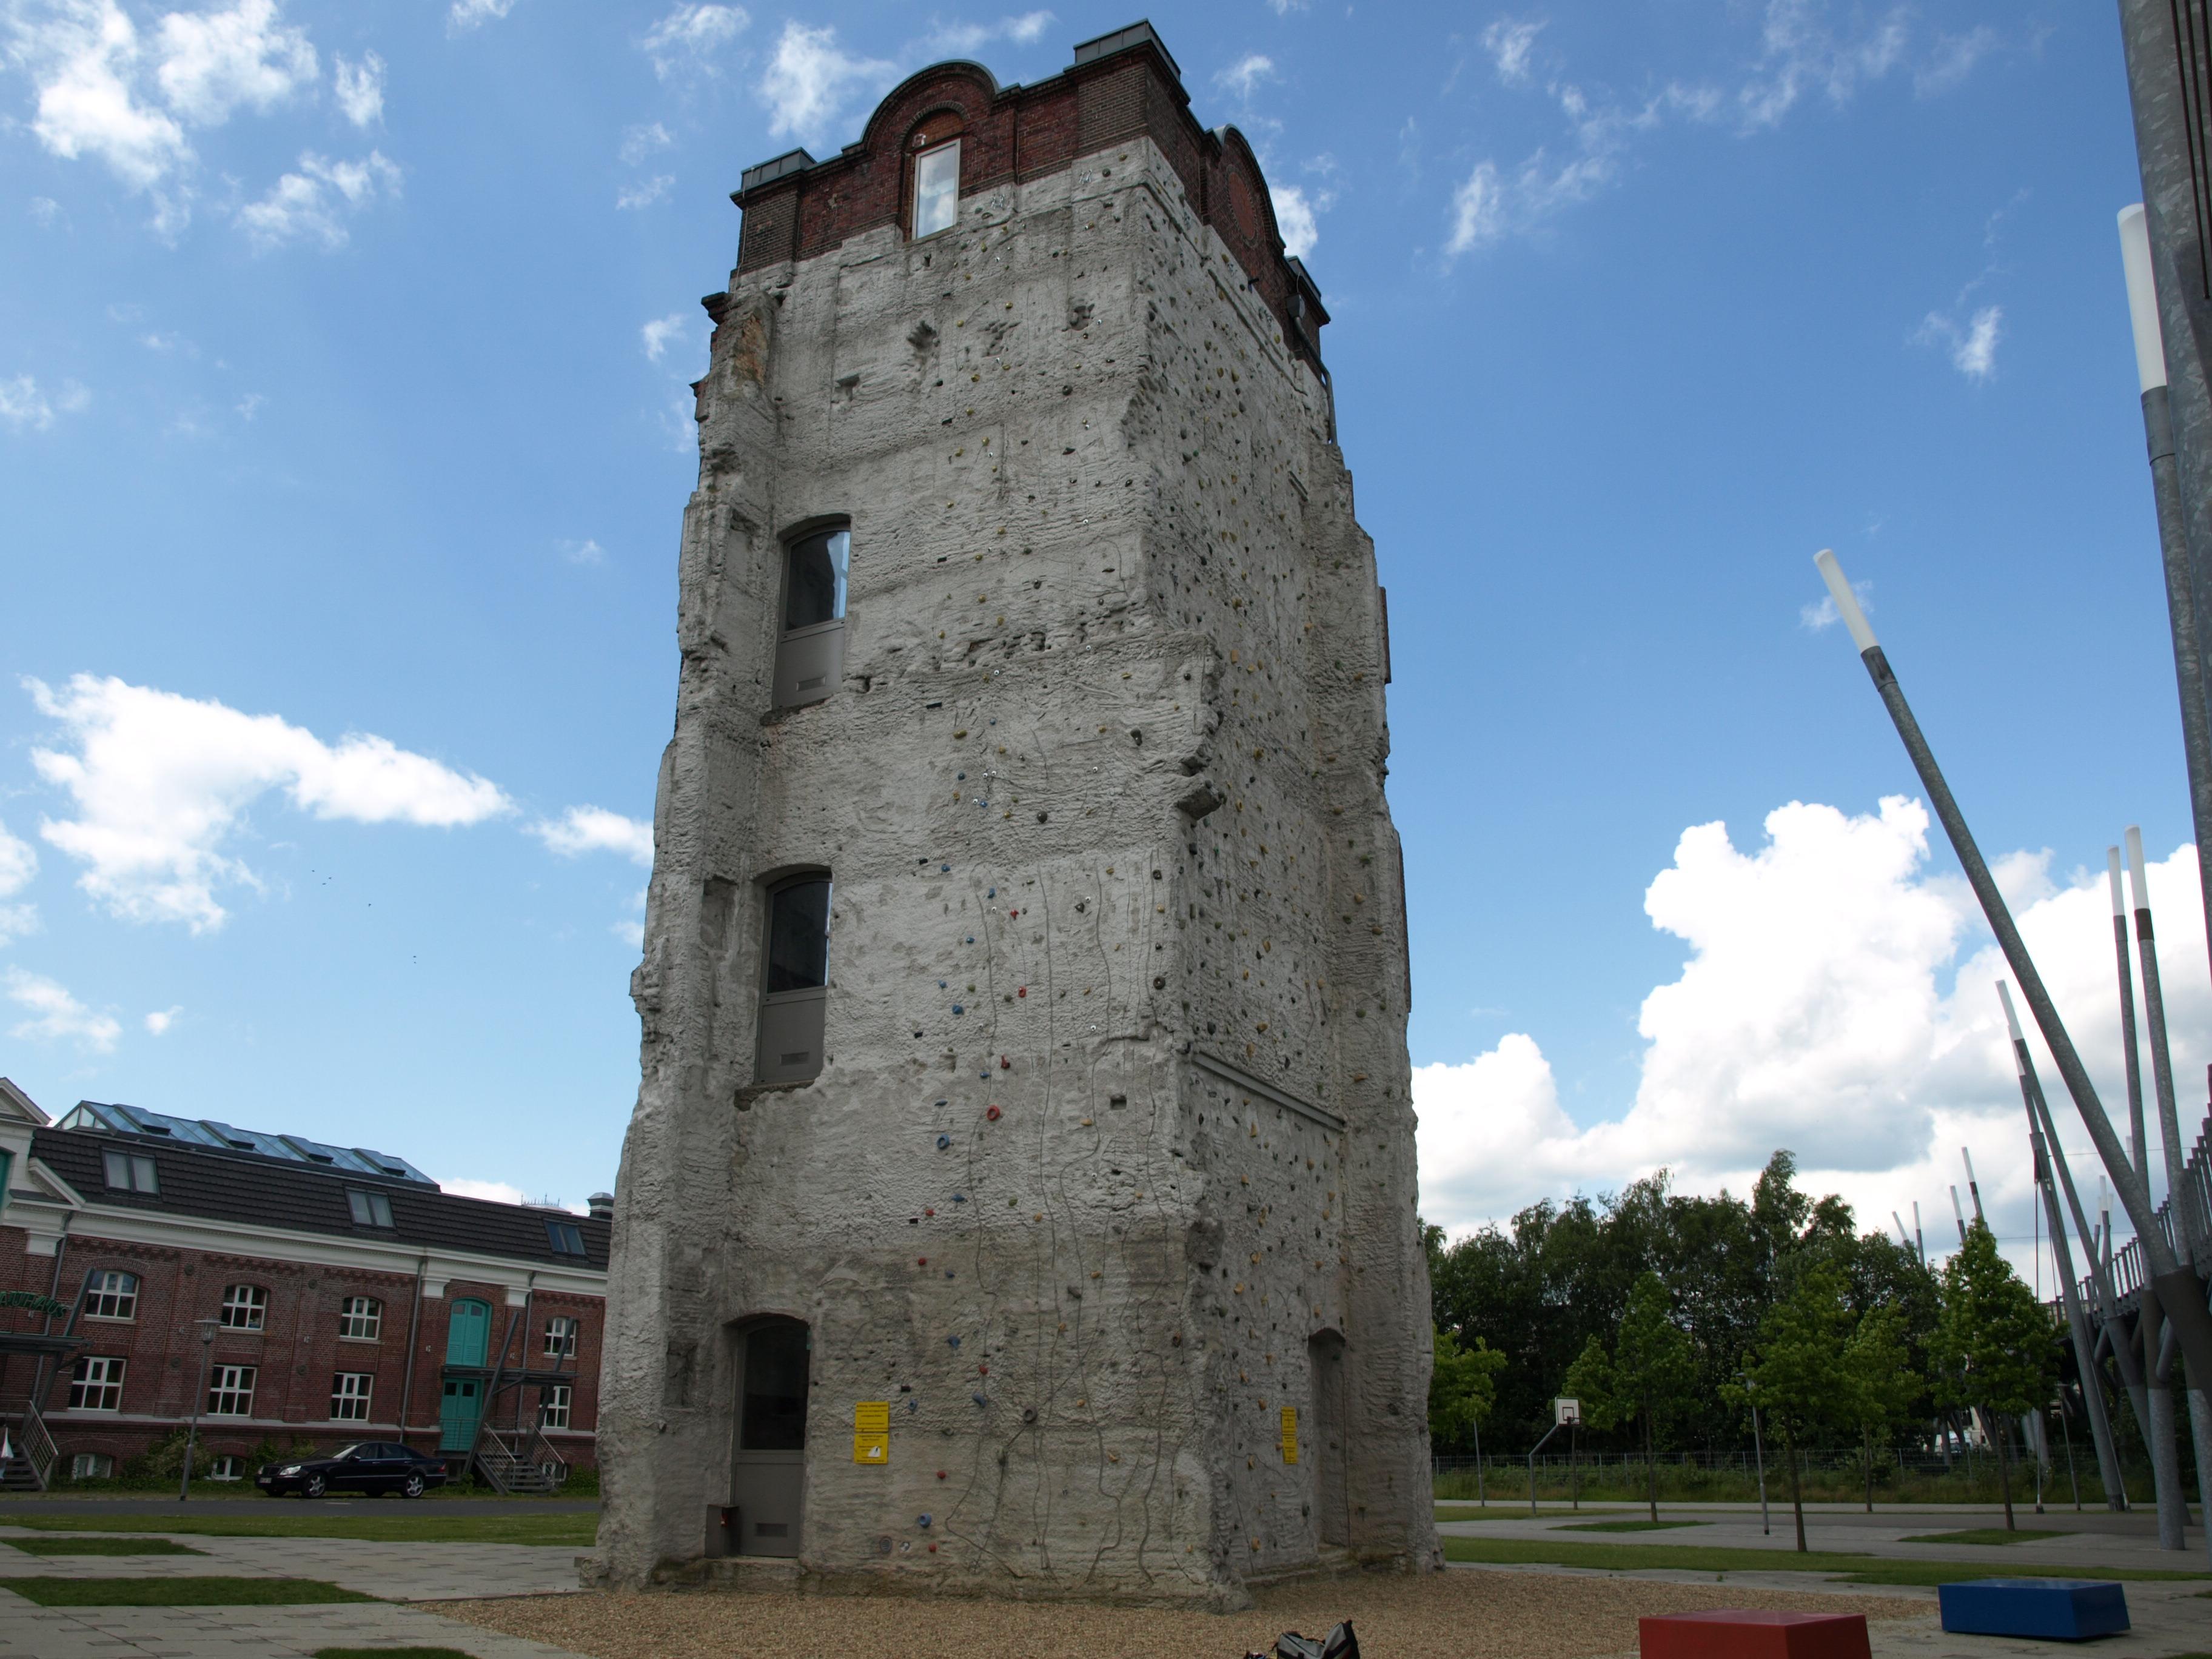 LAGA-Turm